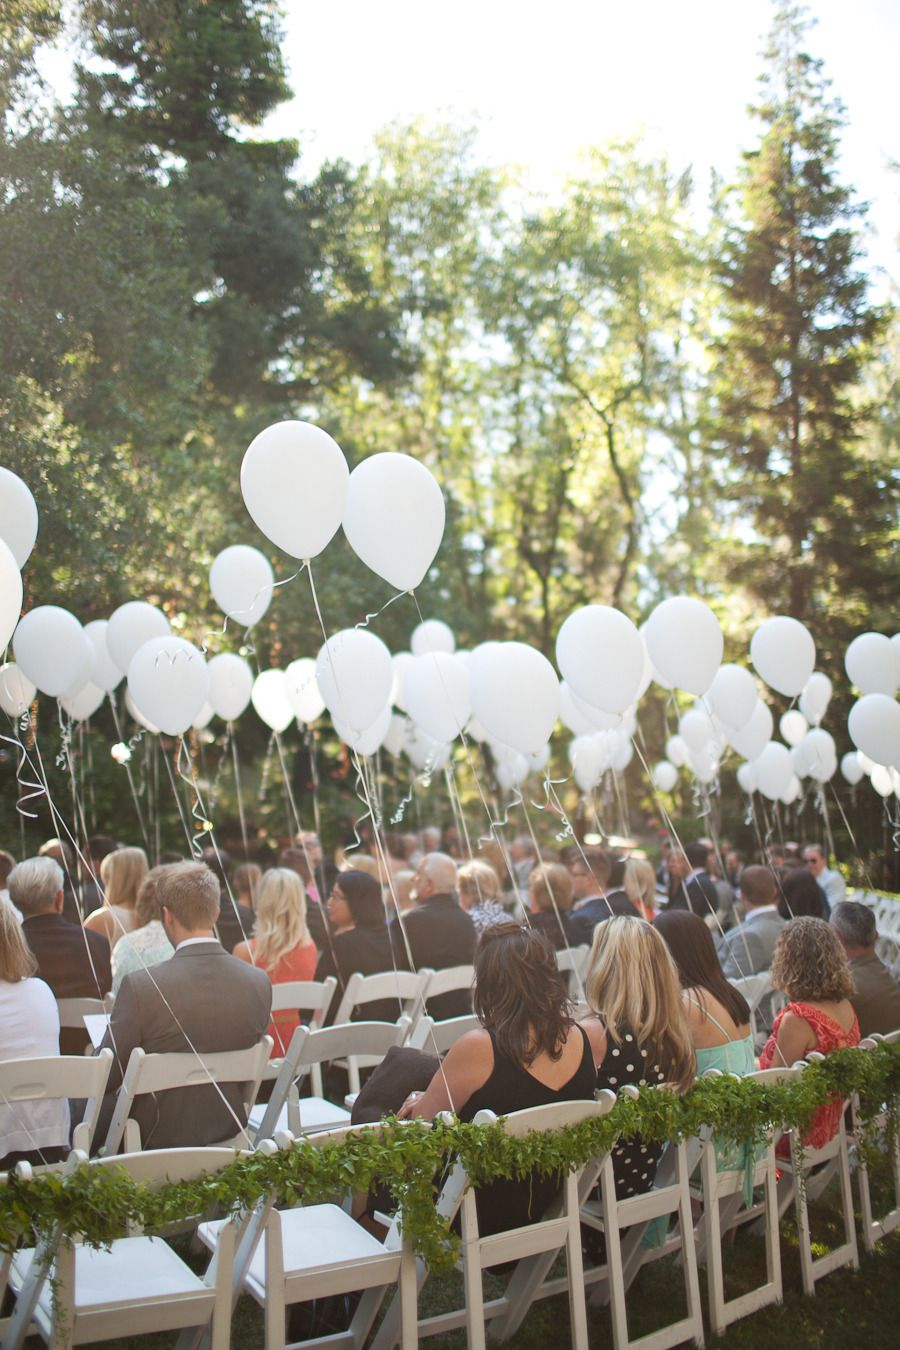 Wedding aisle decor ideas diy  Calamigos Ranch Wedding from Annie McElwain Photography  White